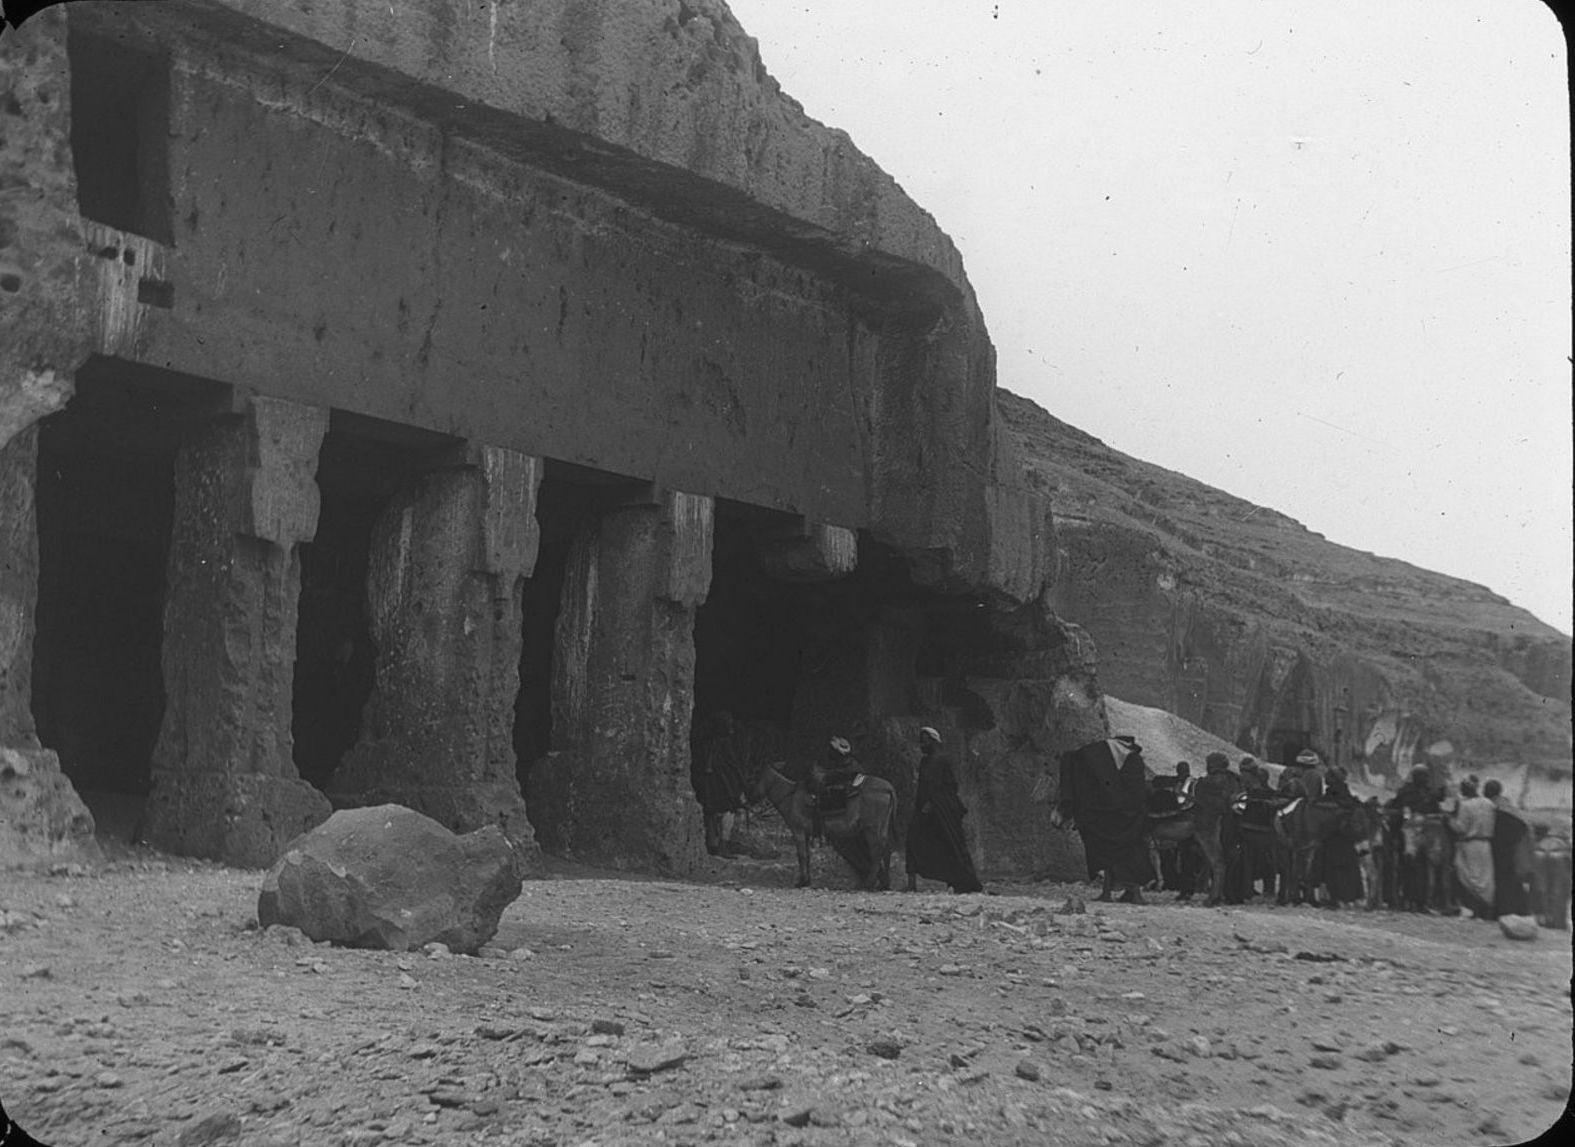 Бени-Хасан. Одна из гробниц